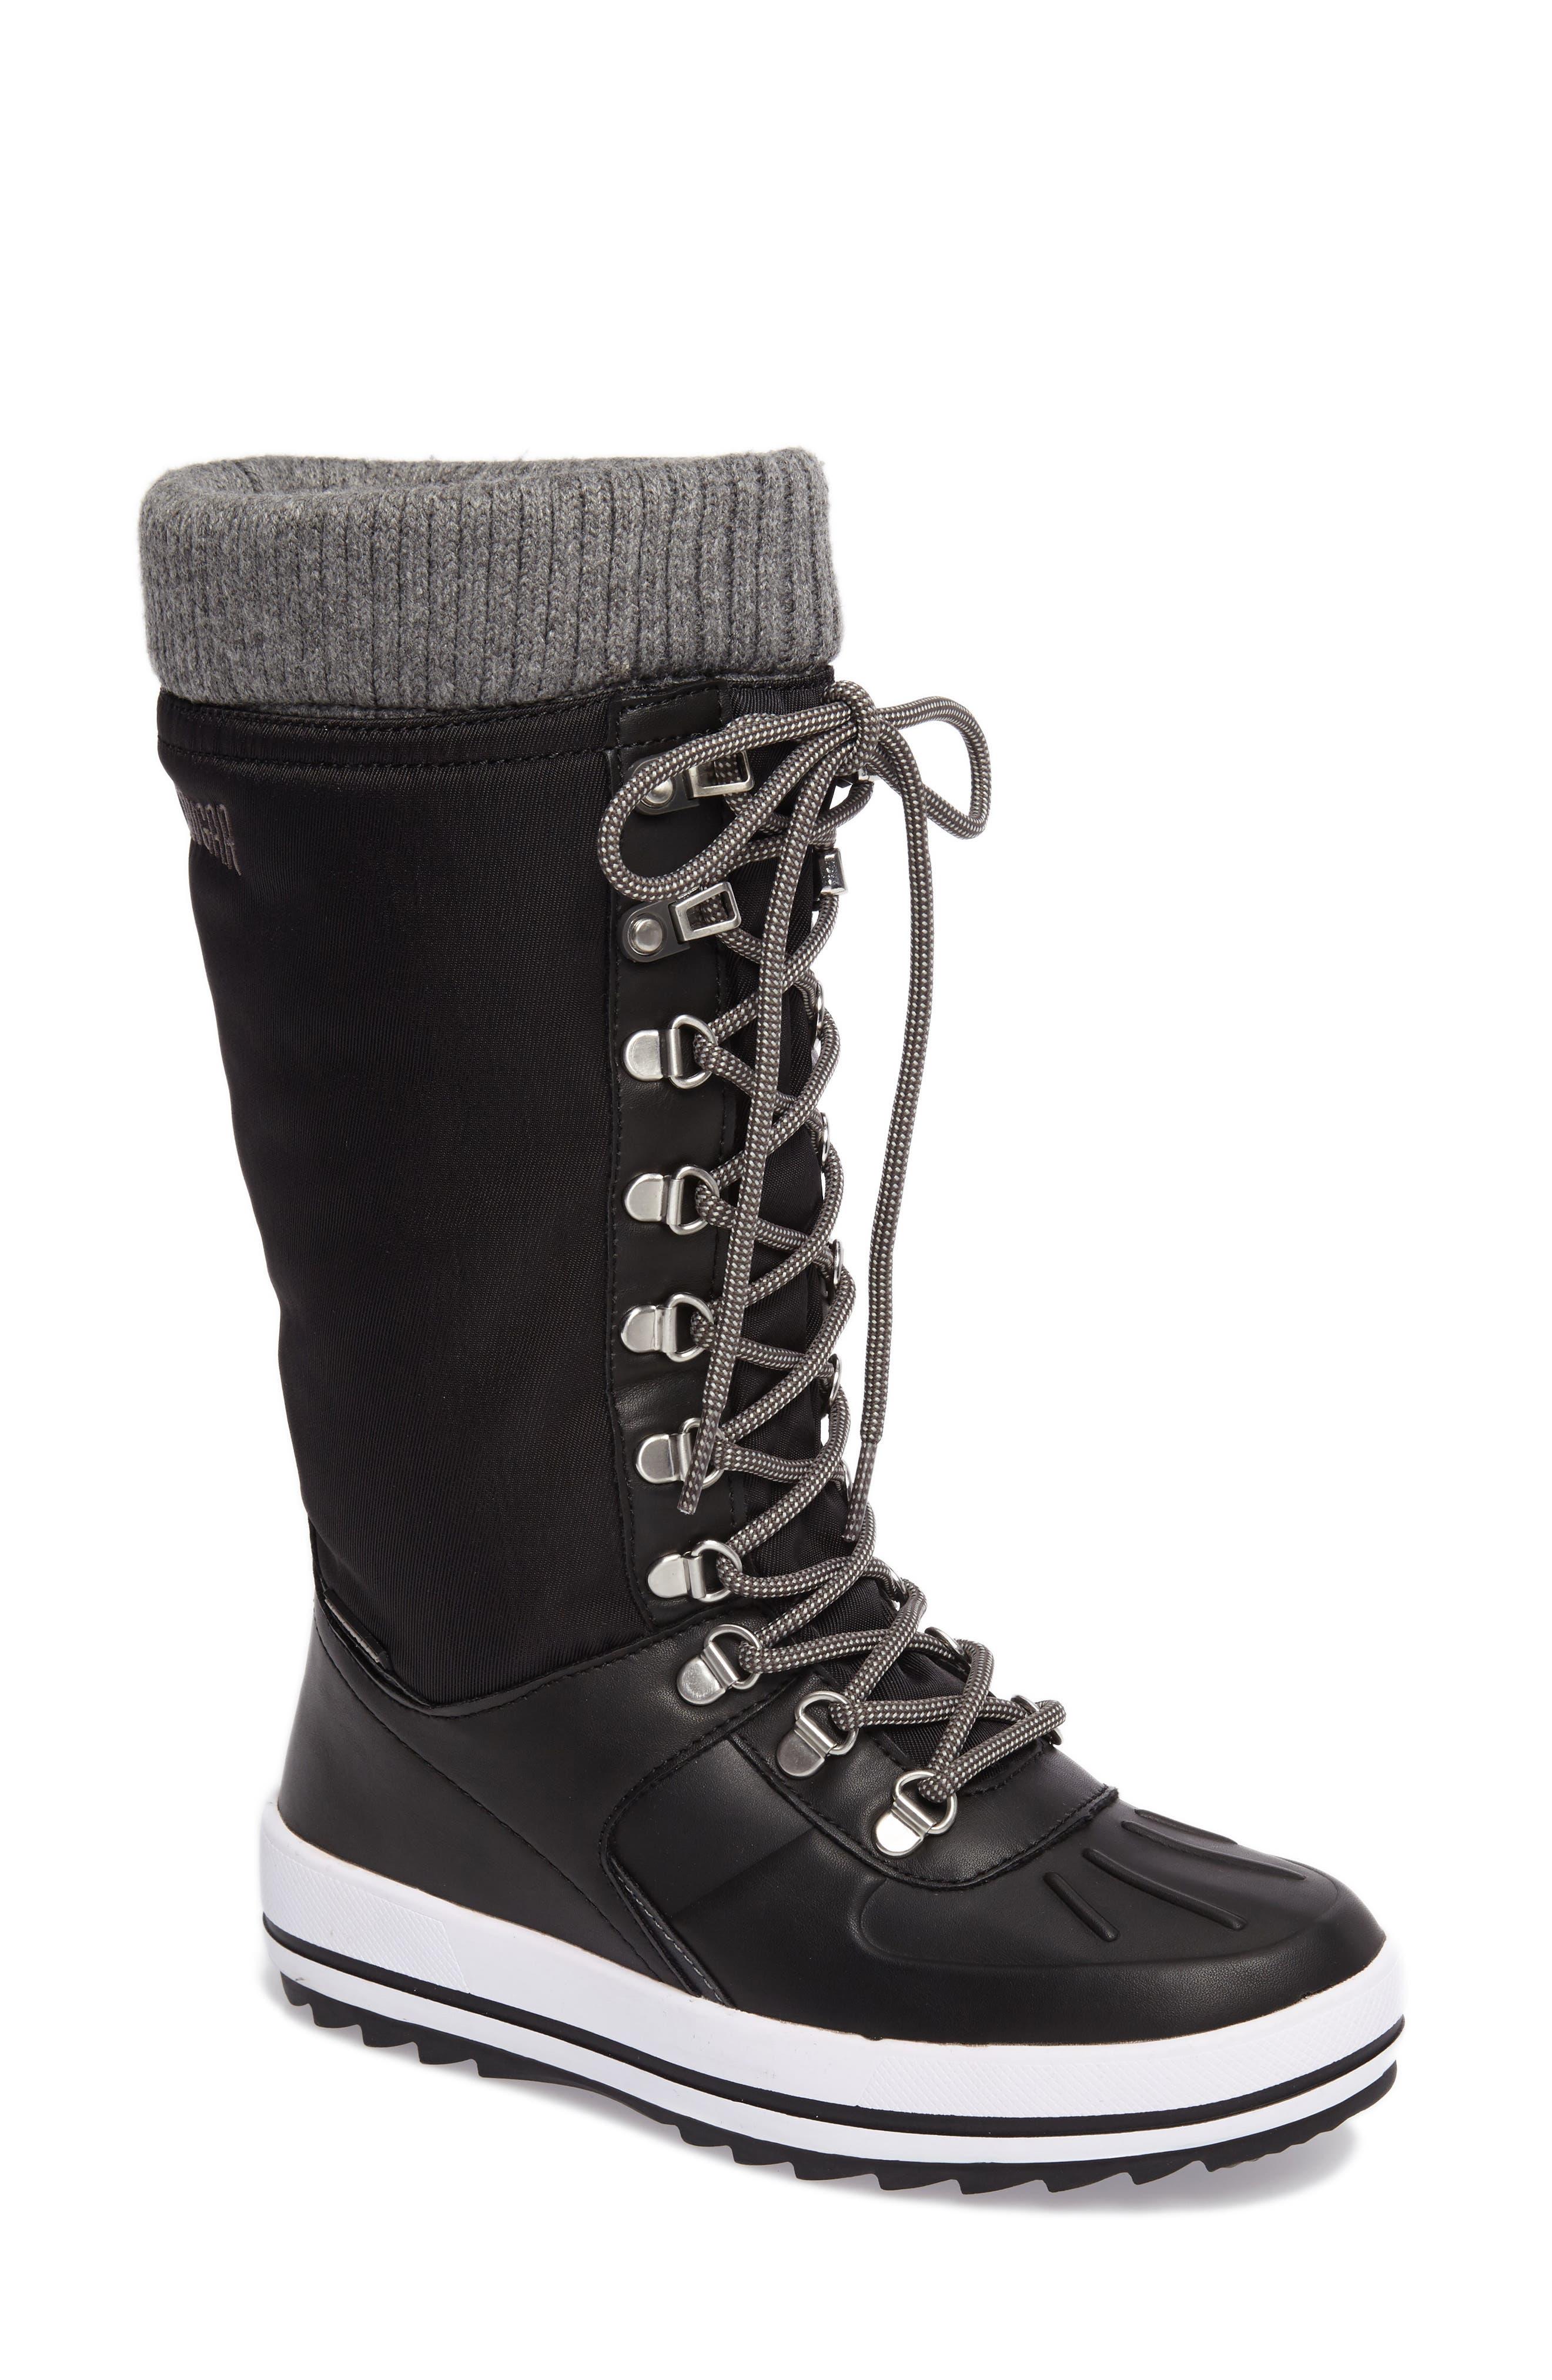 Vancouver Waterproof Winter Boot,                         Main,                         color, BLACK